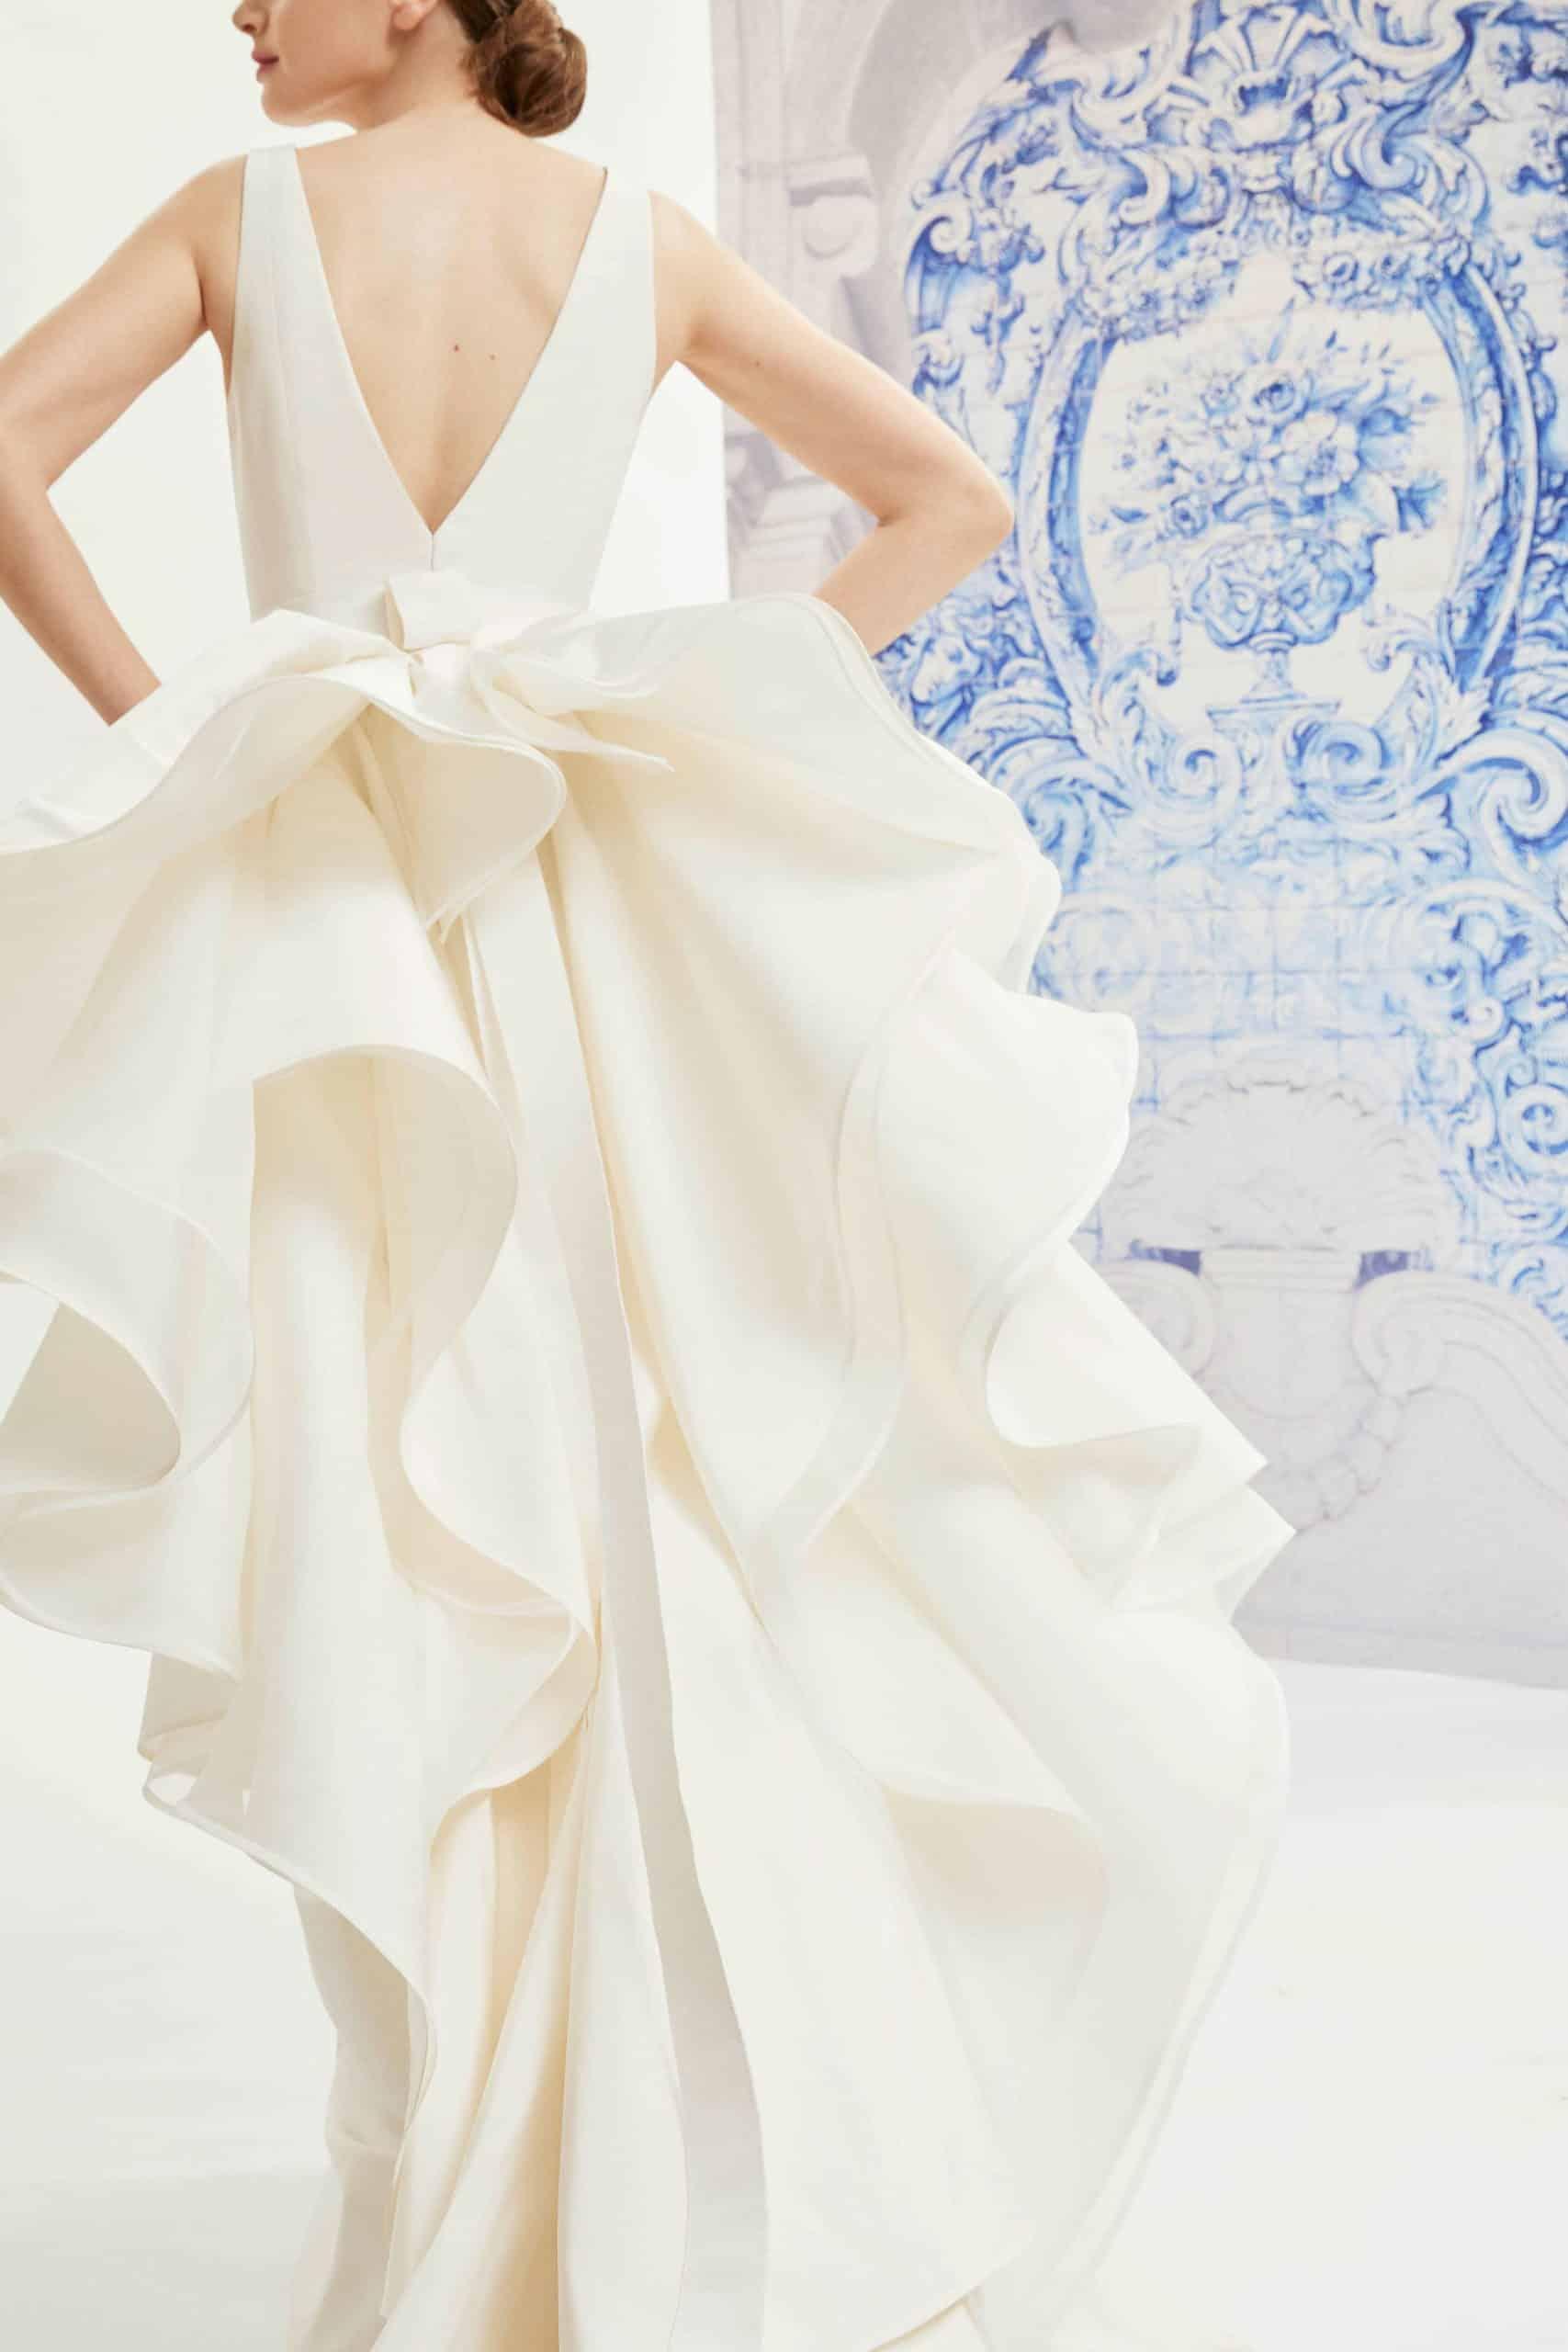 wedding dress with back bow with tail by Carolina Herrera